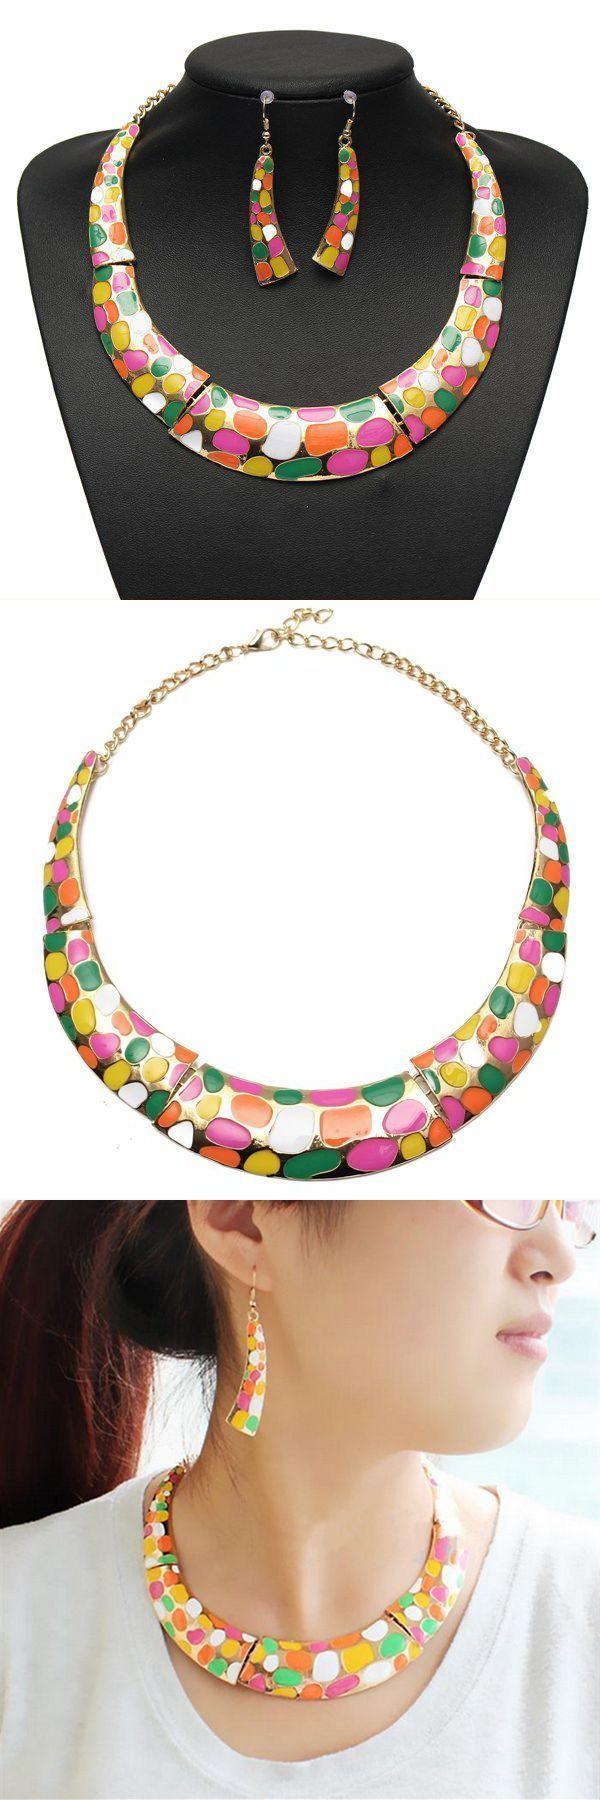 Enamel geometric crescent earrings pendant necklace women jewelry set jewelry set display #indian #jewelry #set #ebay #jewelry #set #with #stones #mr #t #jewelry #set #vivaldi #jewelry #set